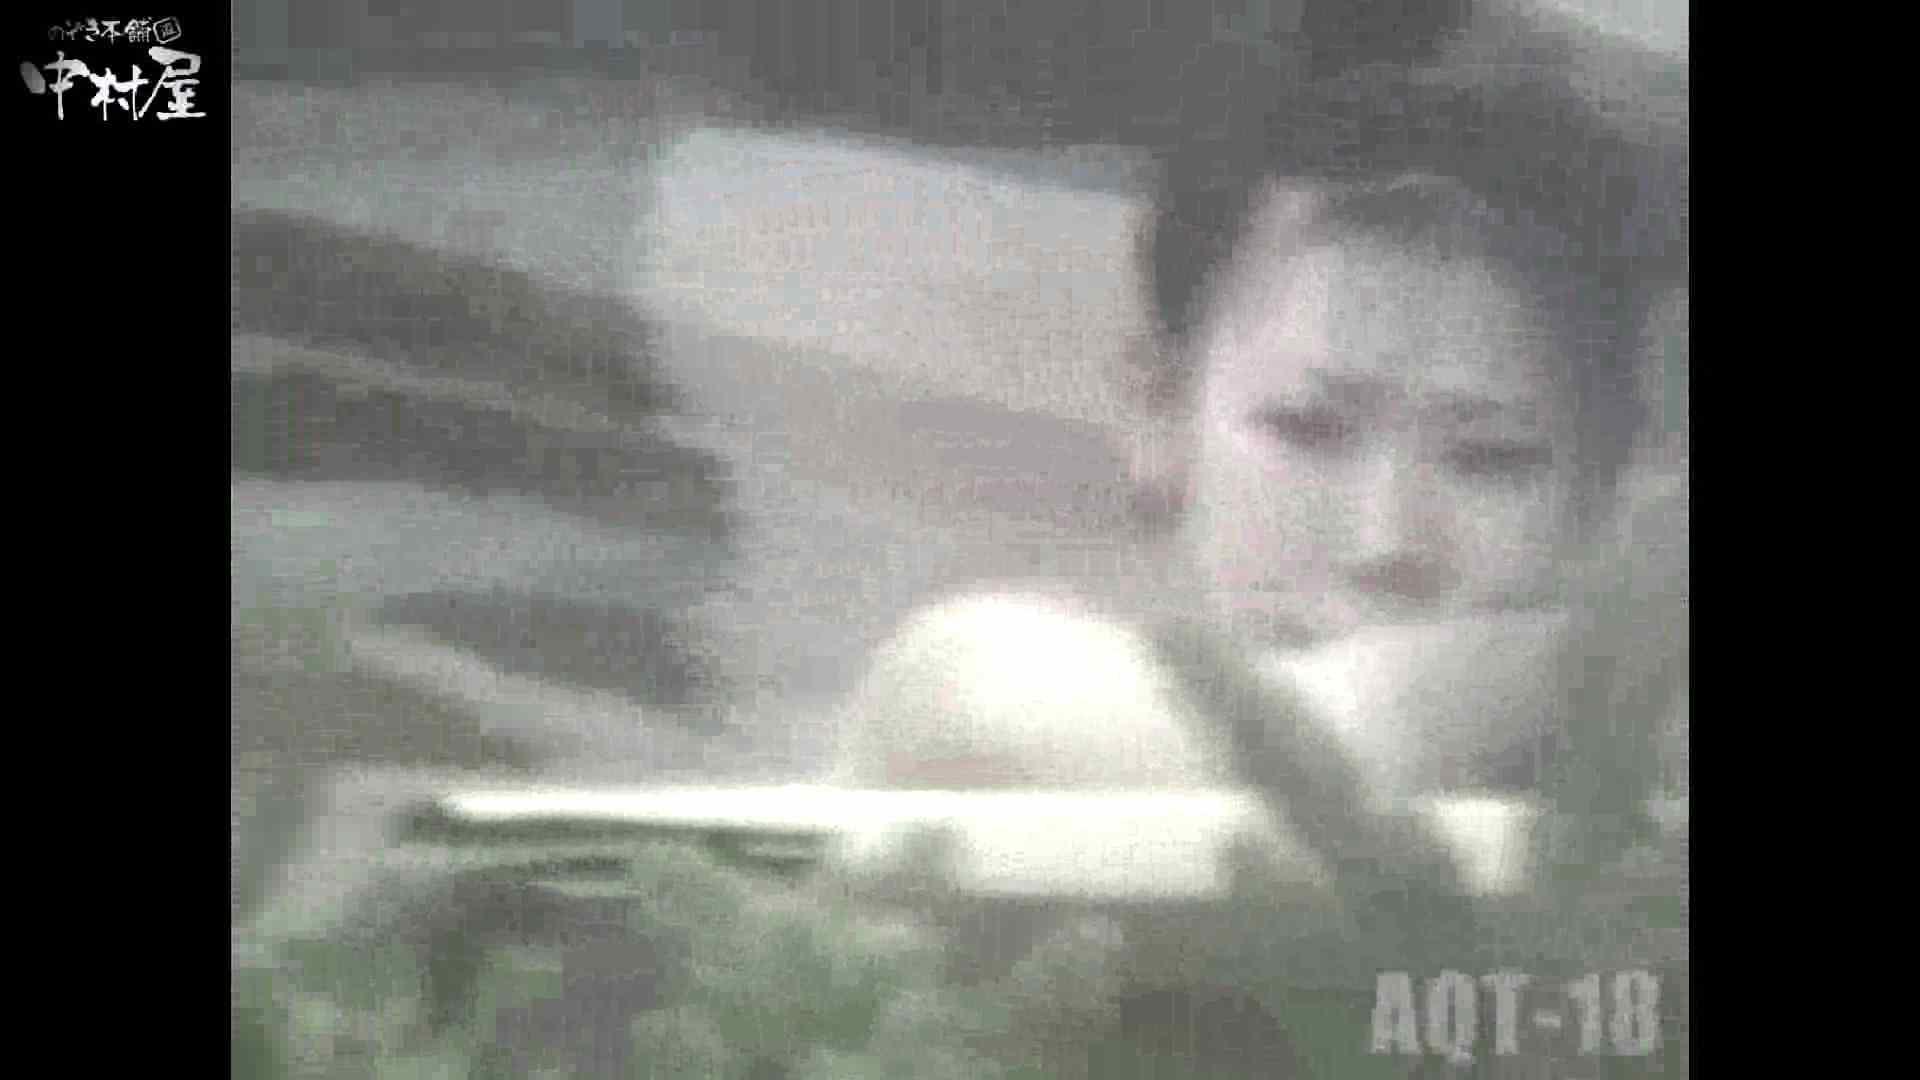 Aquaな露天風呂Vol.882潜入盗撮露天風呂十八判湯 其の二 露天 | 潜入  78PICs 9